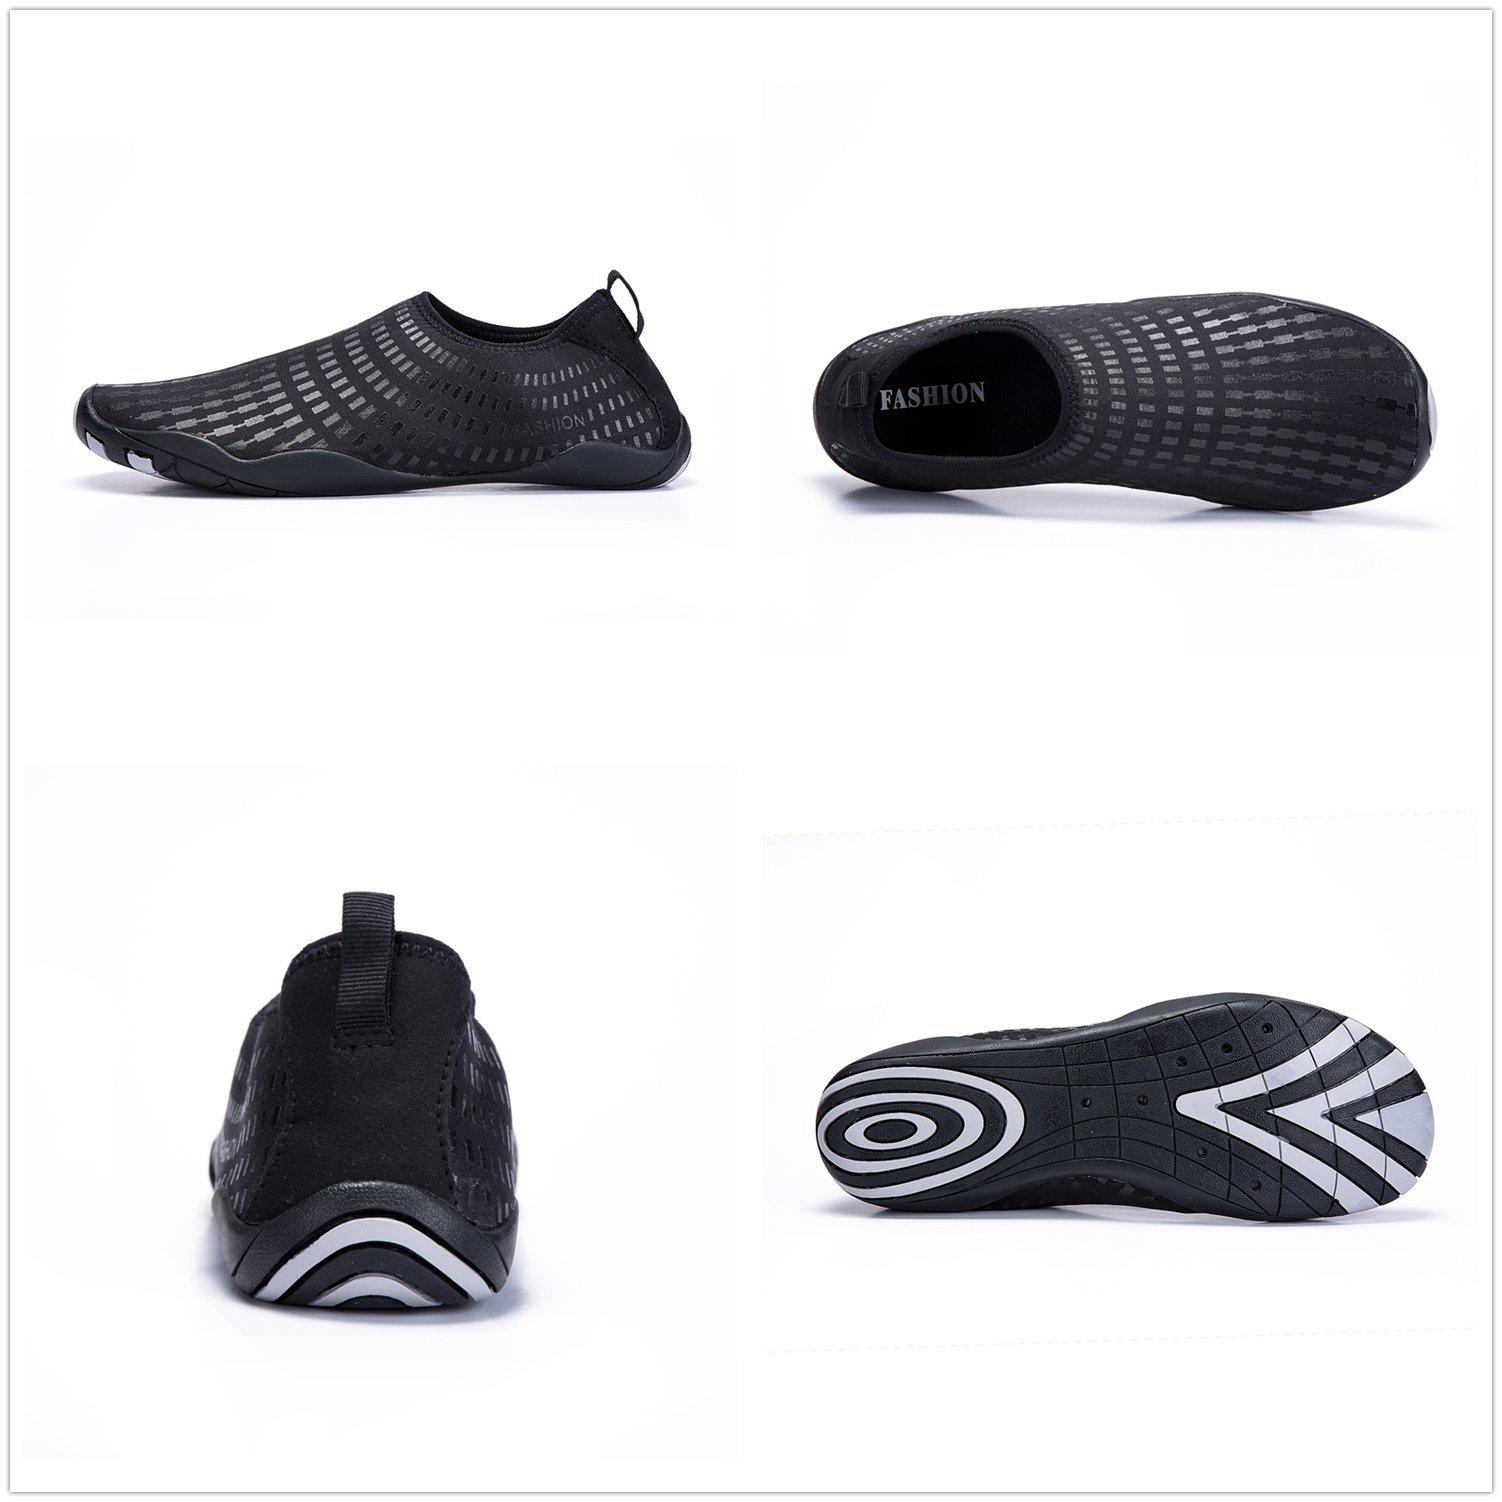 LeKuni Women's Mesh Slip on Water Shoes (12 Women/9.5 Men,42_61_Black) by LeKuni (Image #3)